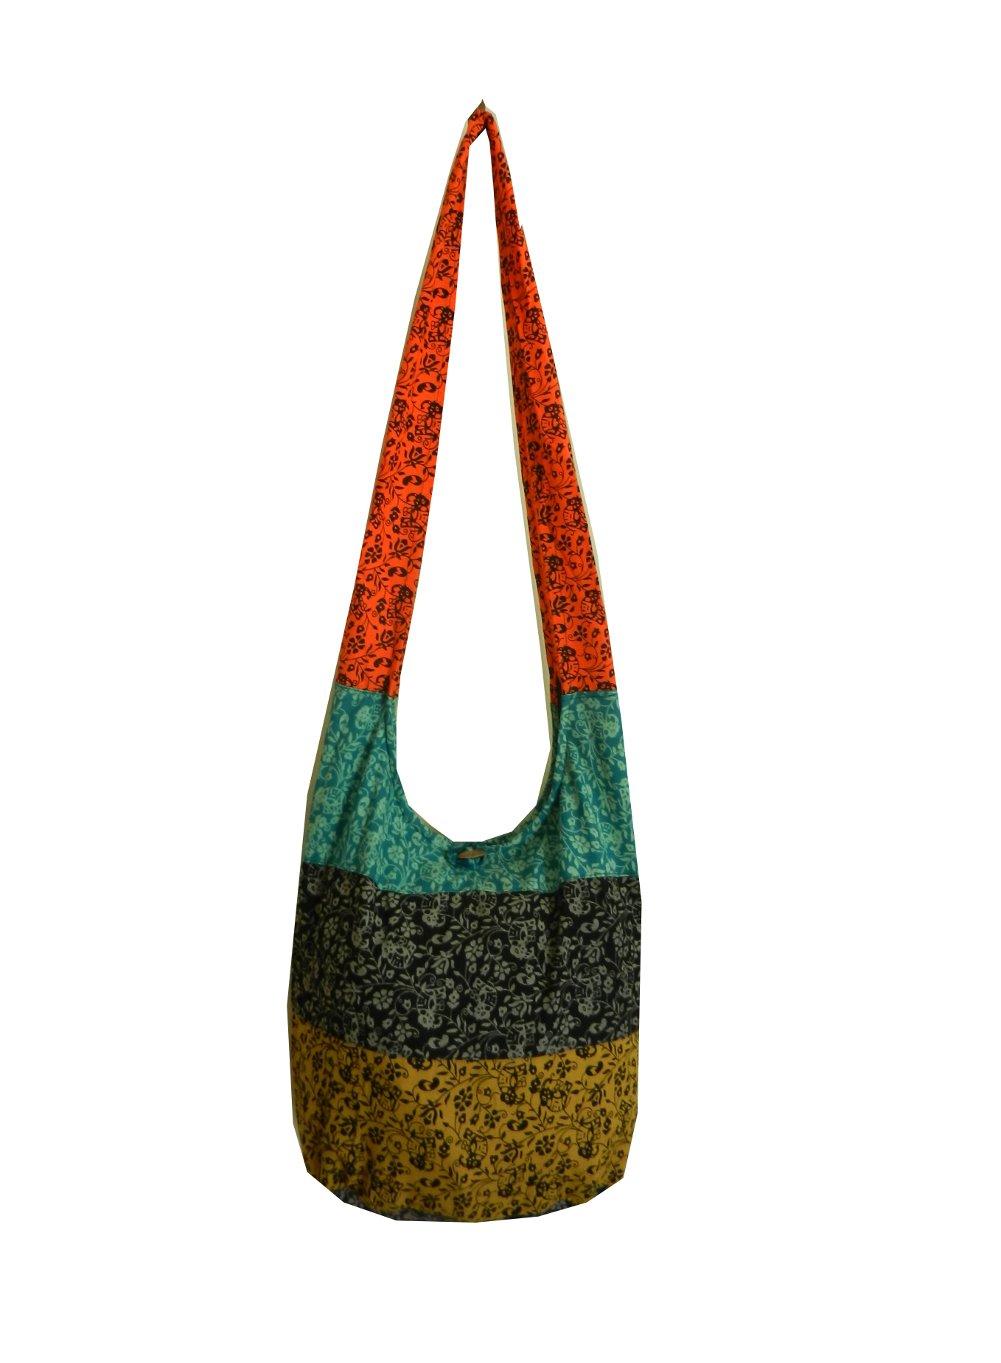 BenThai Products Hippie Hobo Sling Crossbody Bag Messenger Purse, Elephant Floral, Assorted Color